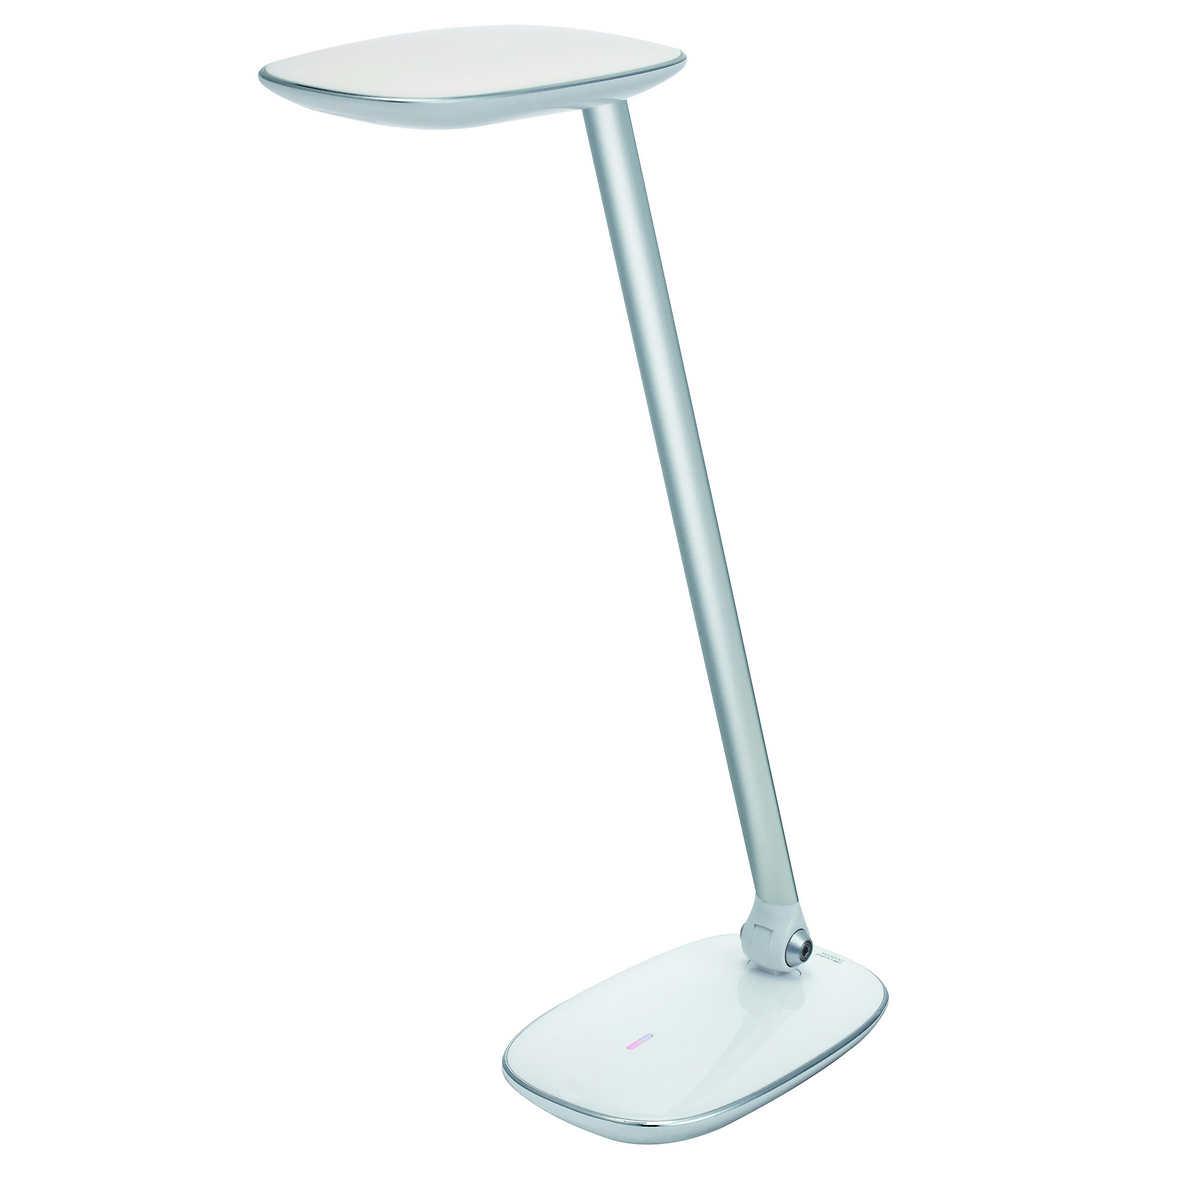 Normande Lighting LED Desk Lamp W/ 2.0A USB Port - Lamps Costco